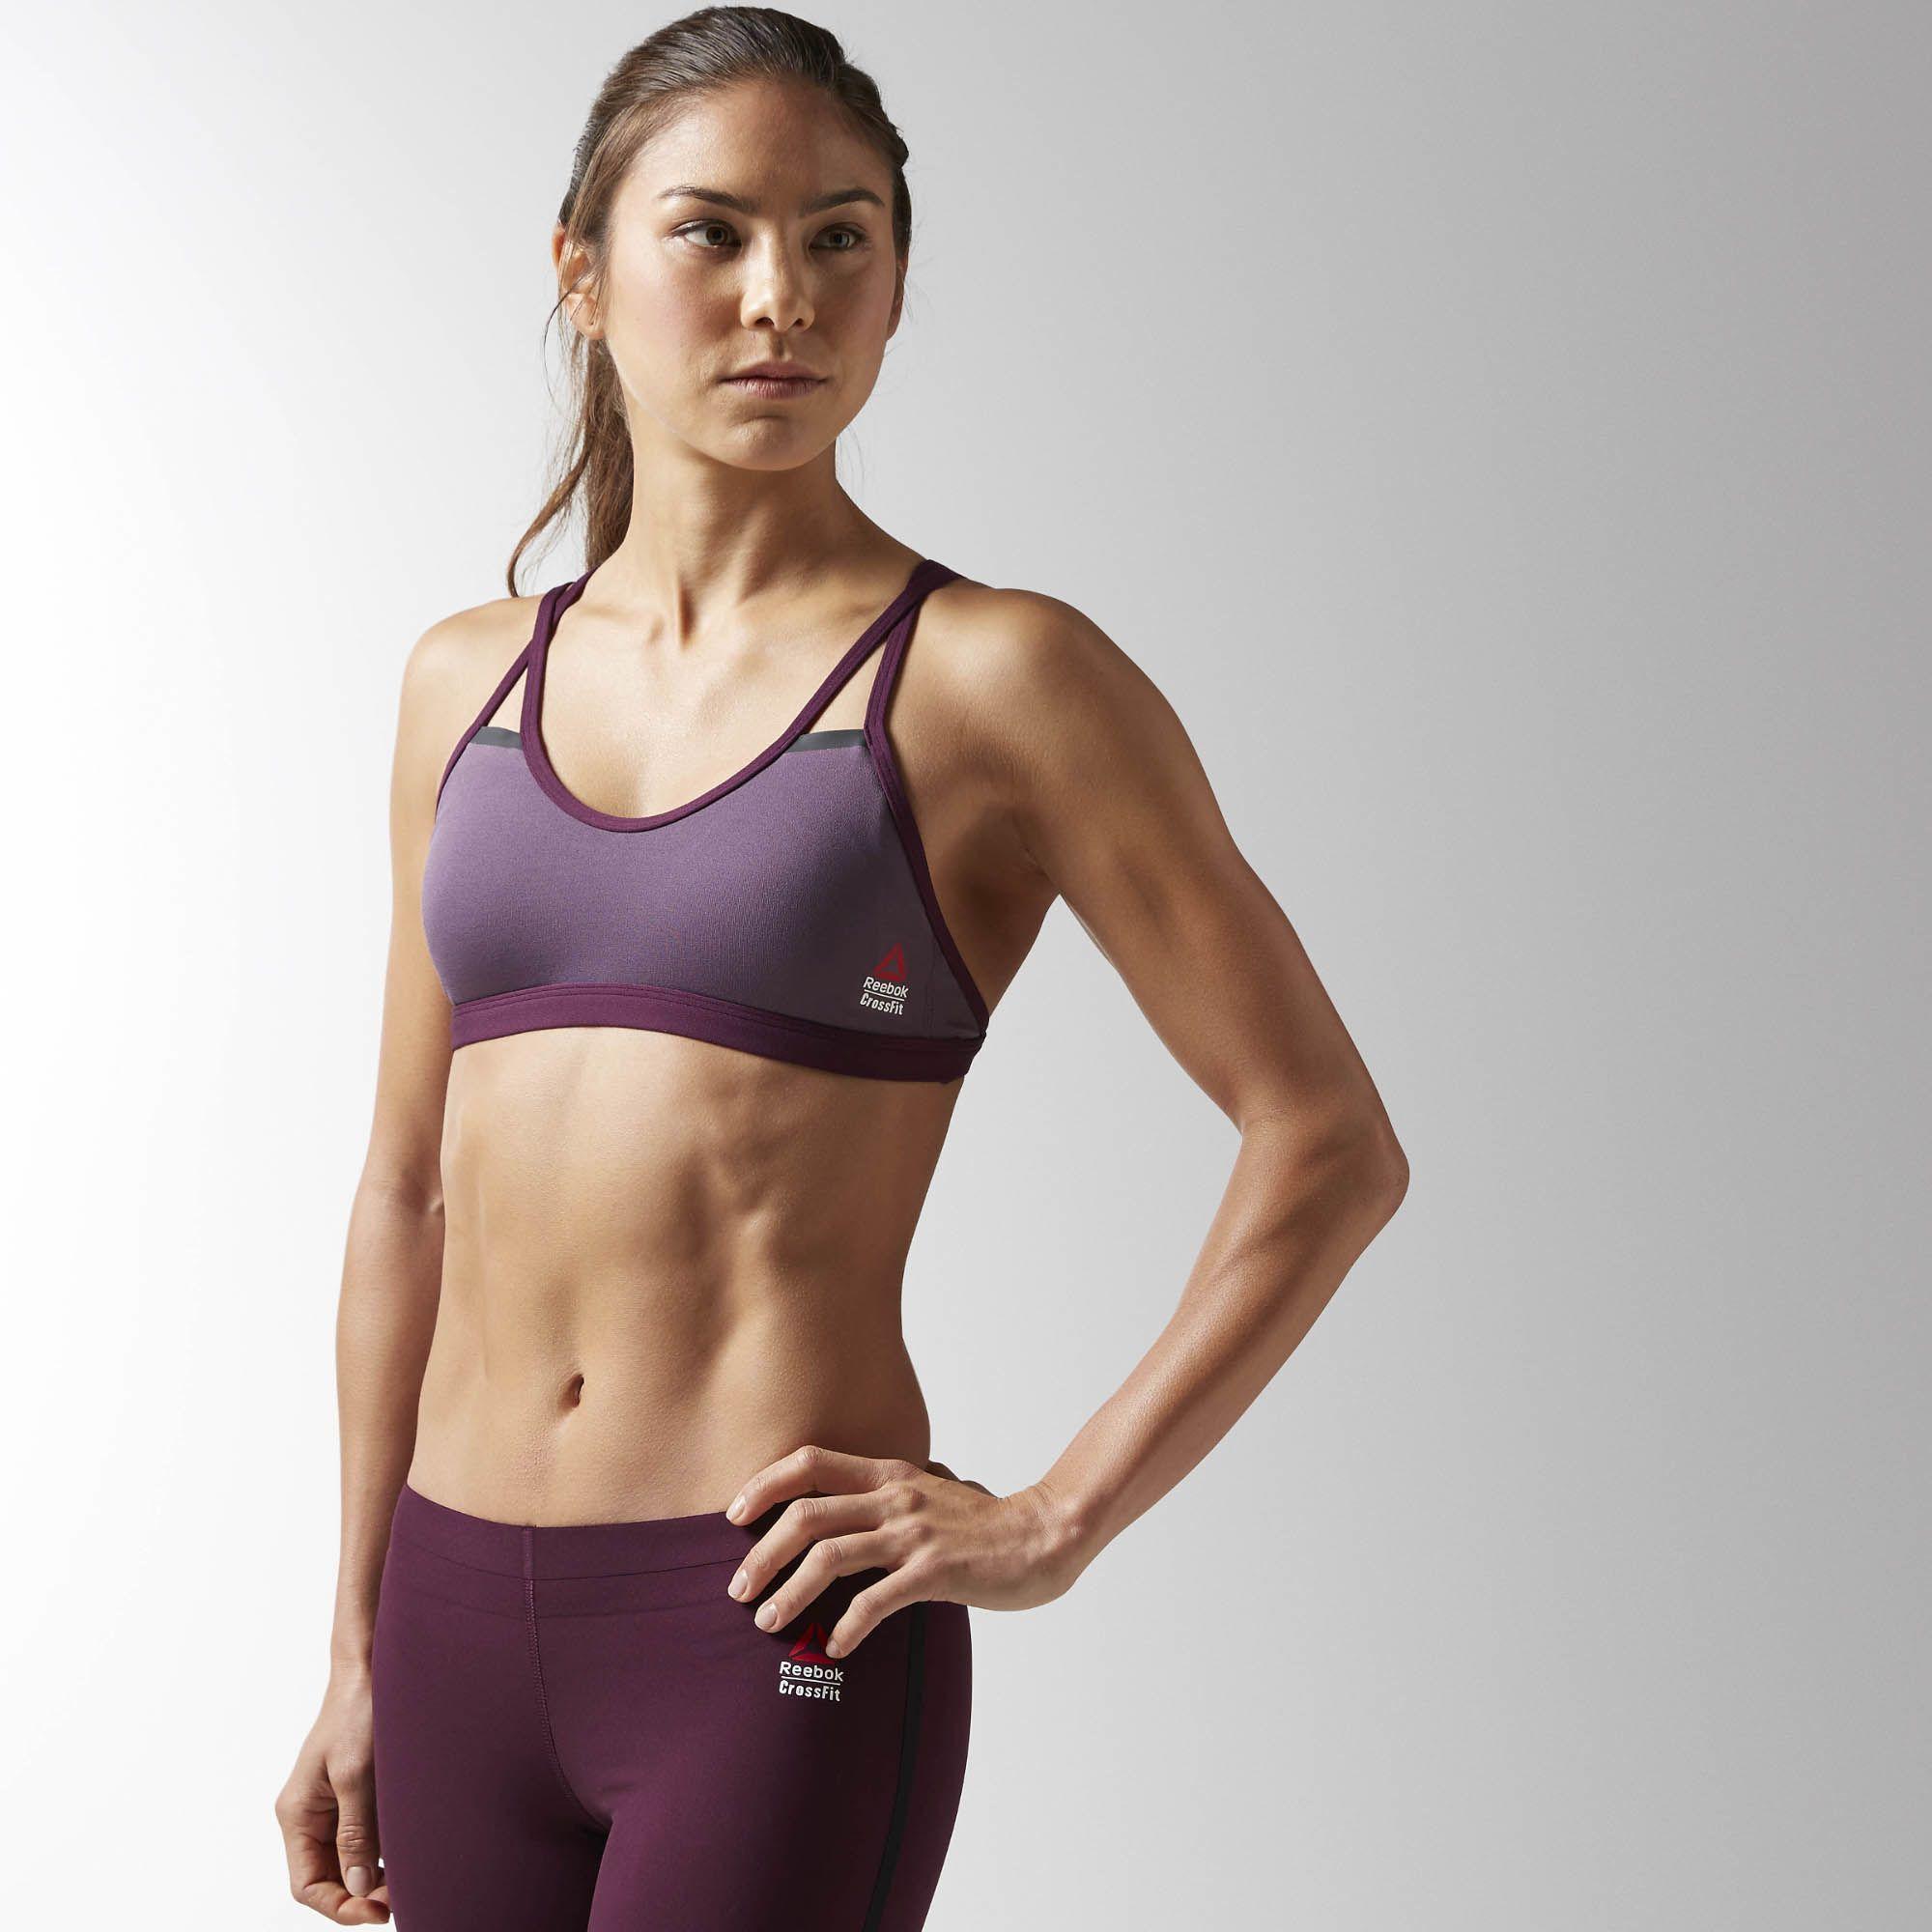 cd229ca13b2 Reebok - Reebok CrossFit Skinny Double Strap Sports Bra